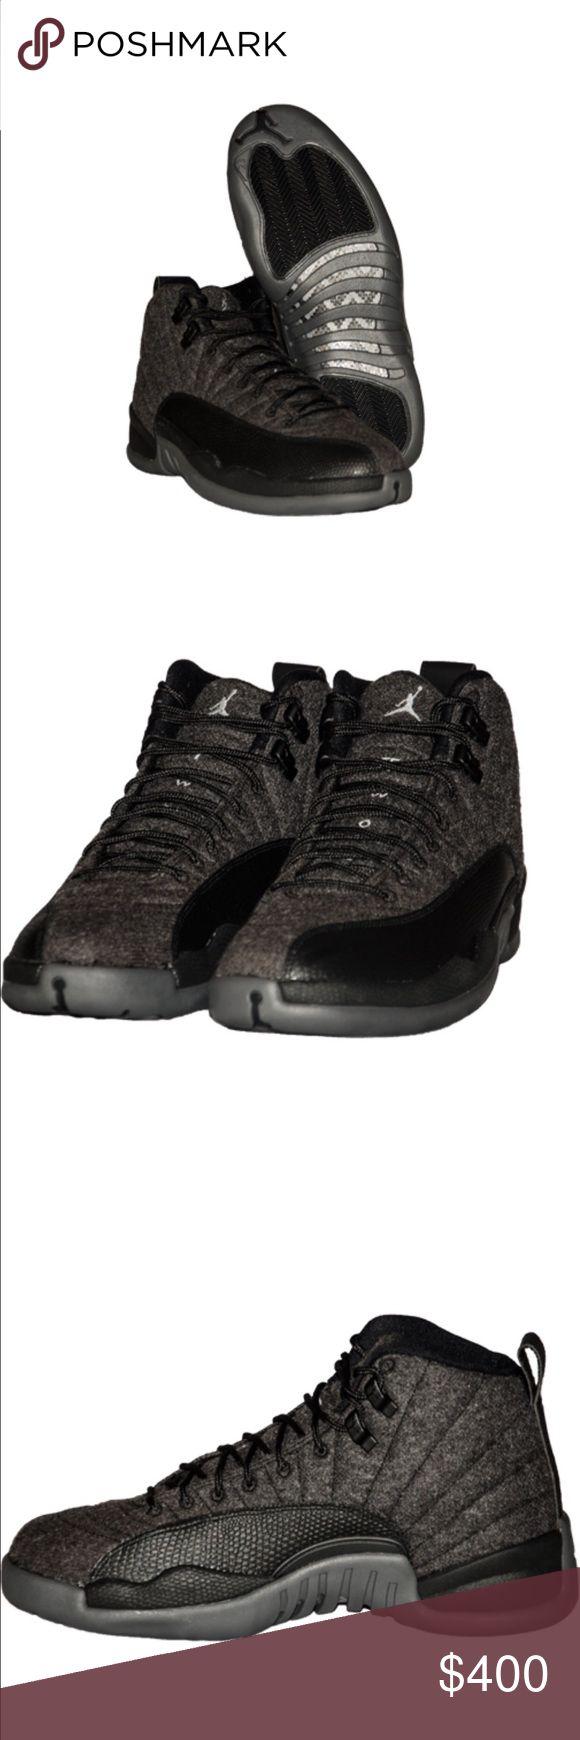 Air Jordan 12 Retro Wool Size 8.5 retro jordans brand new, never been worn before . 100% authentic Jordan Shoes Sneakers